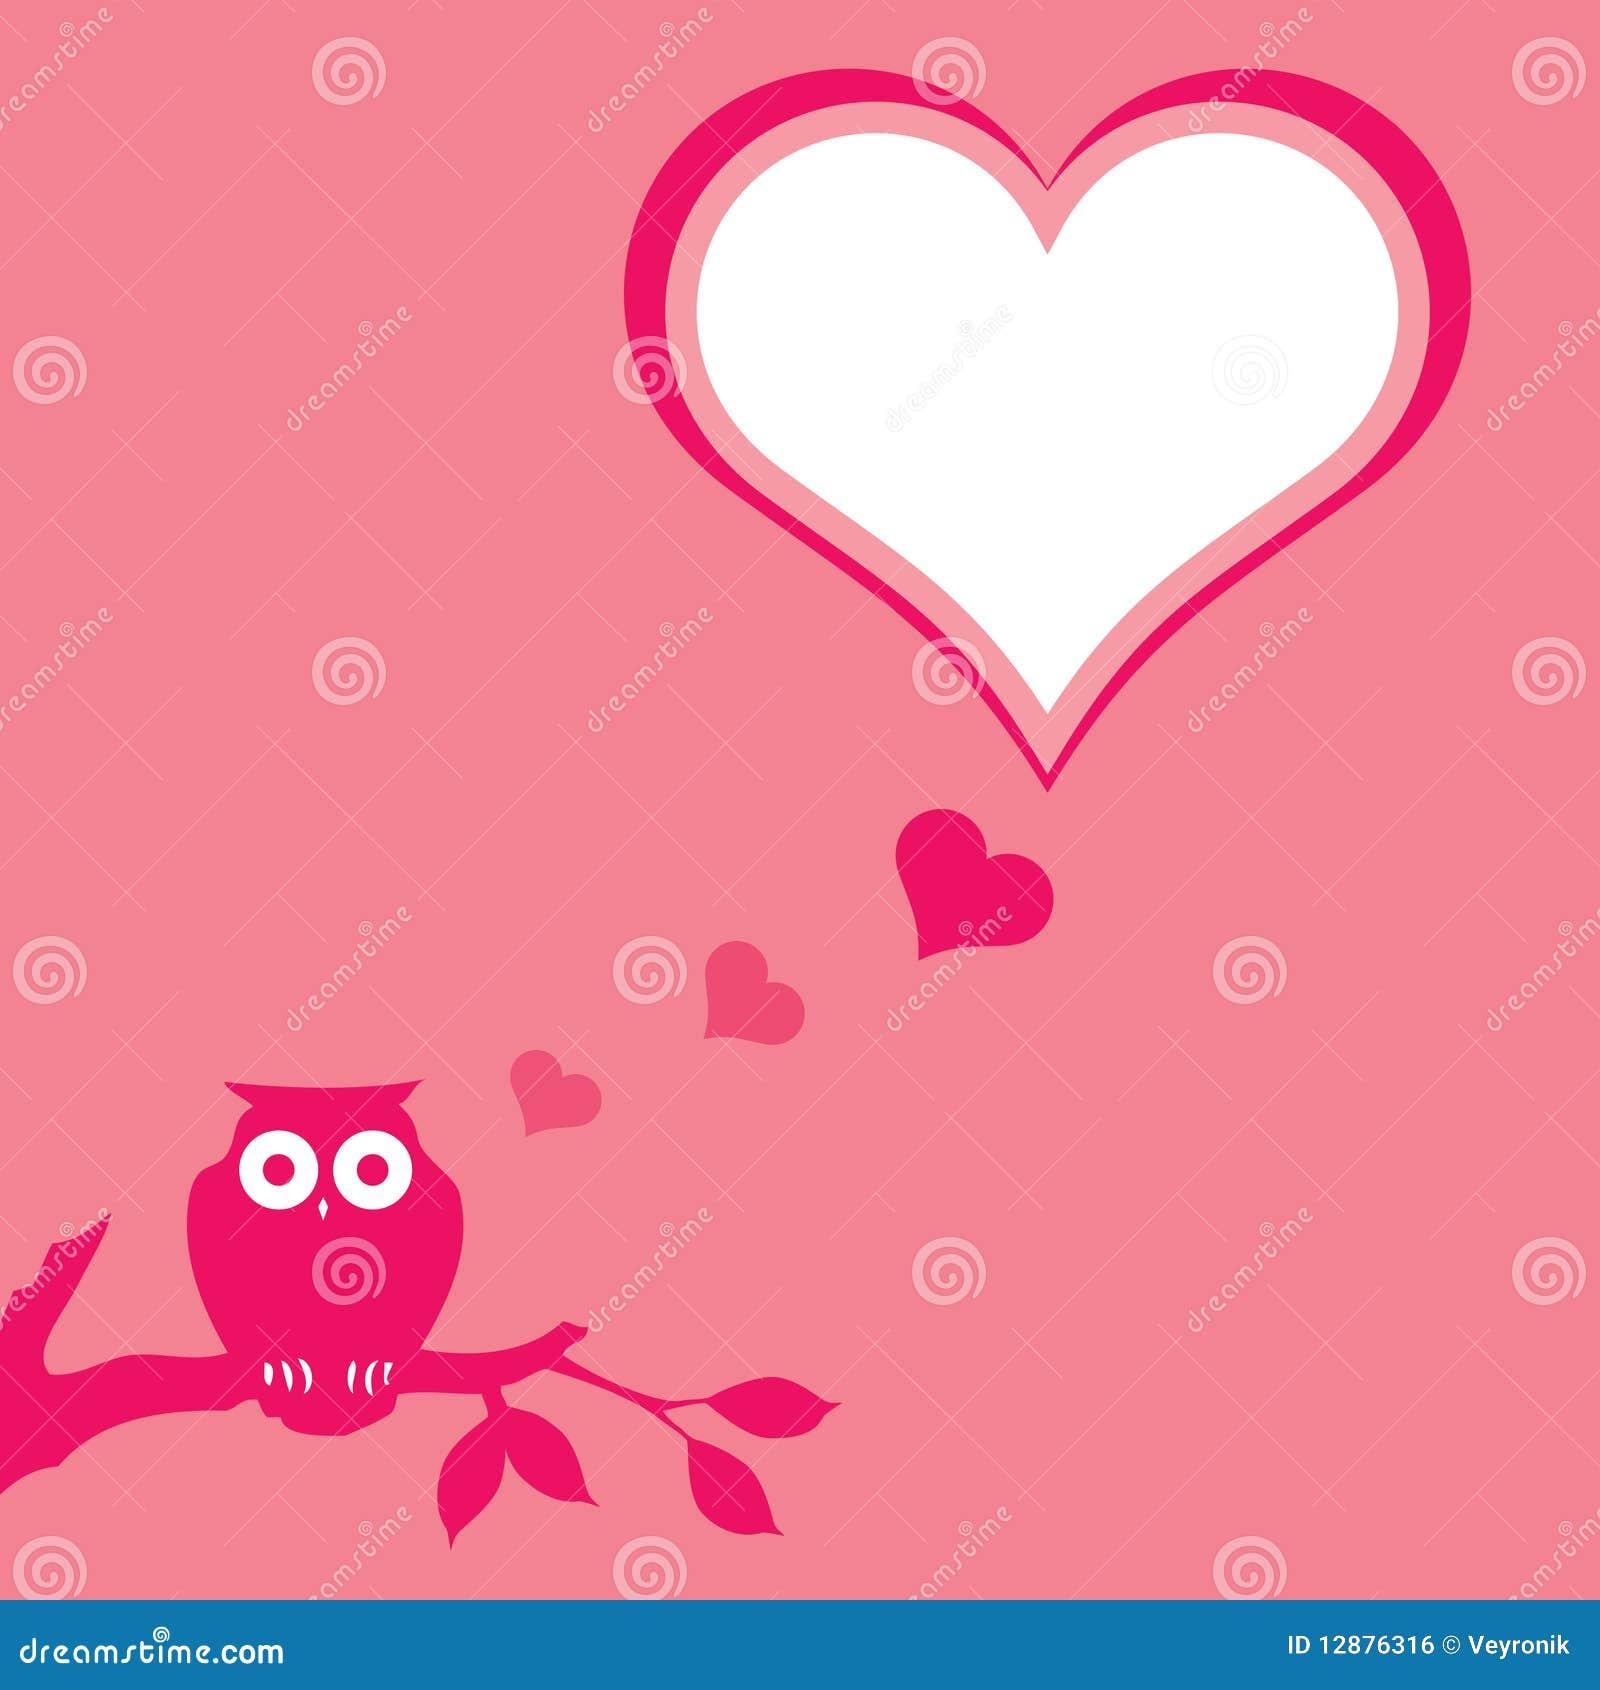 Pink Owl Background Royalty Free Stock Image Image 12876316